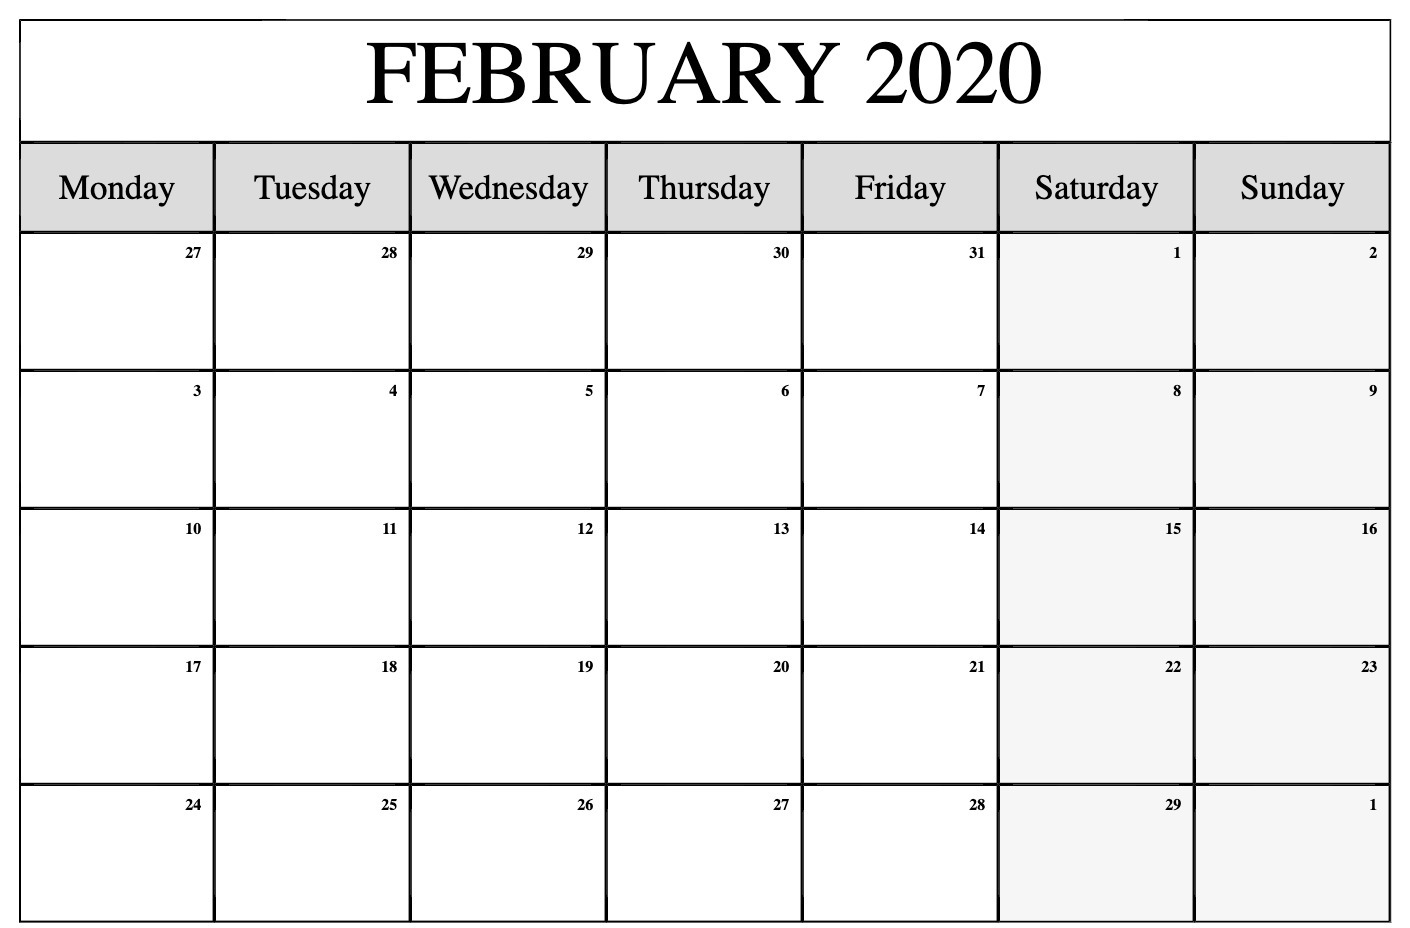 February 2020 Calendar Printable Template